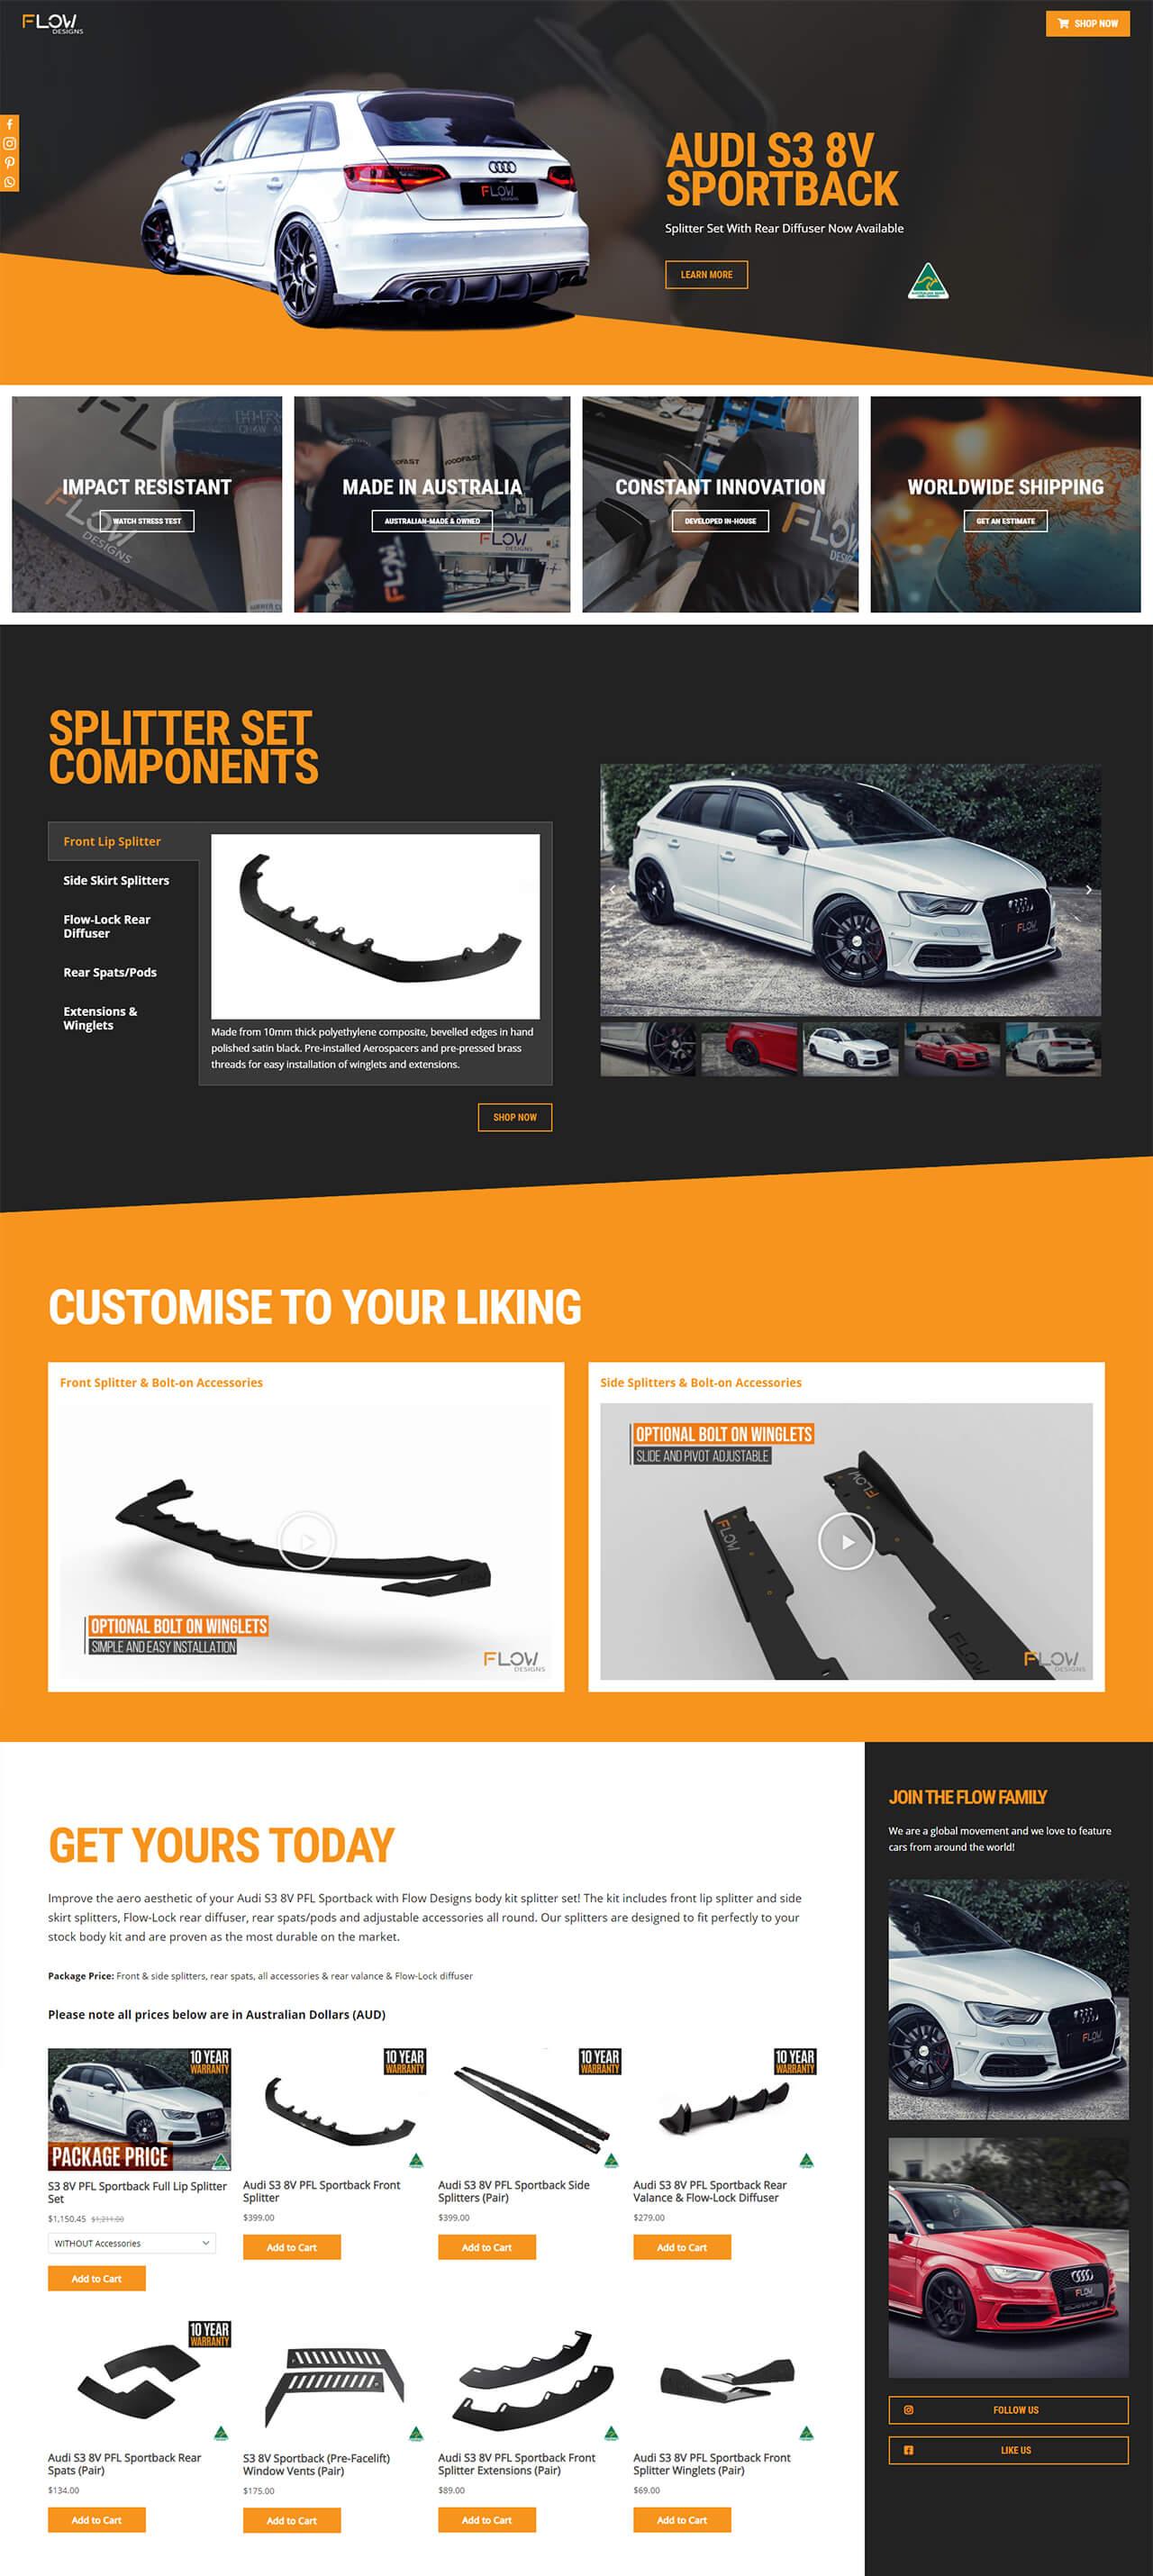 Flow Designs Landing Page Design | Voltekka: Website Design & Digital Marketing Specialists